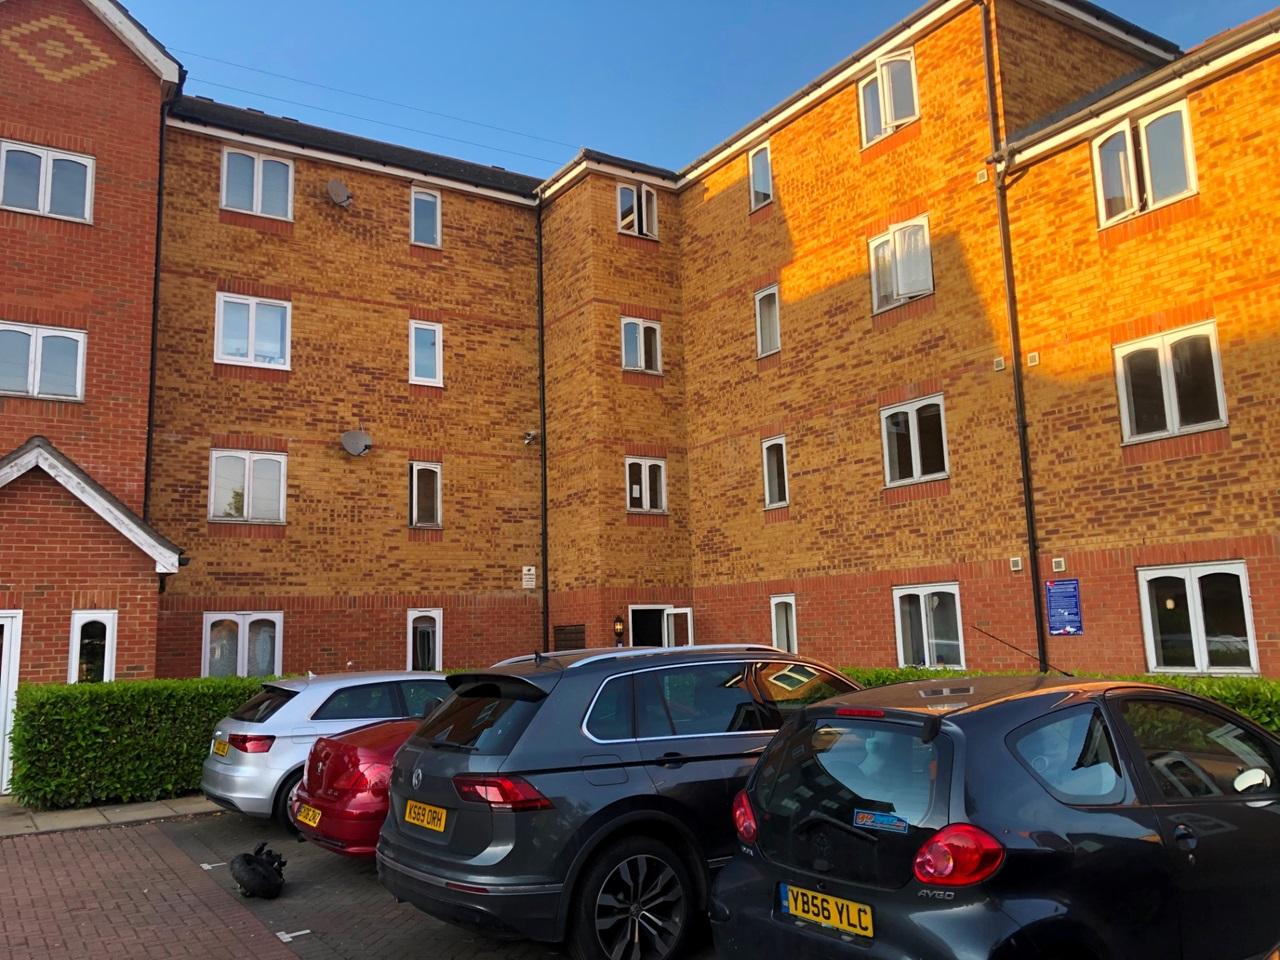 Dartford - 1 Bed Flat, Dunlop Close, DA1 - To Rent Now for ...